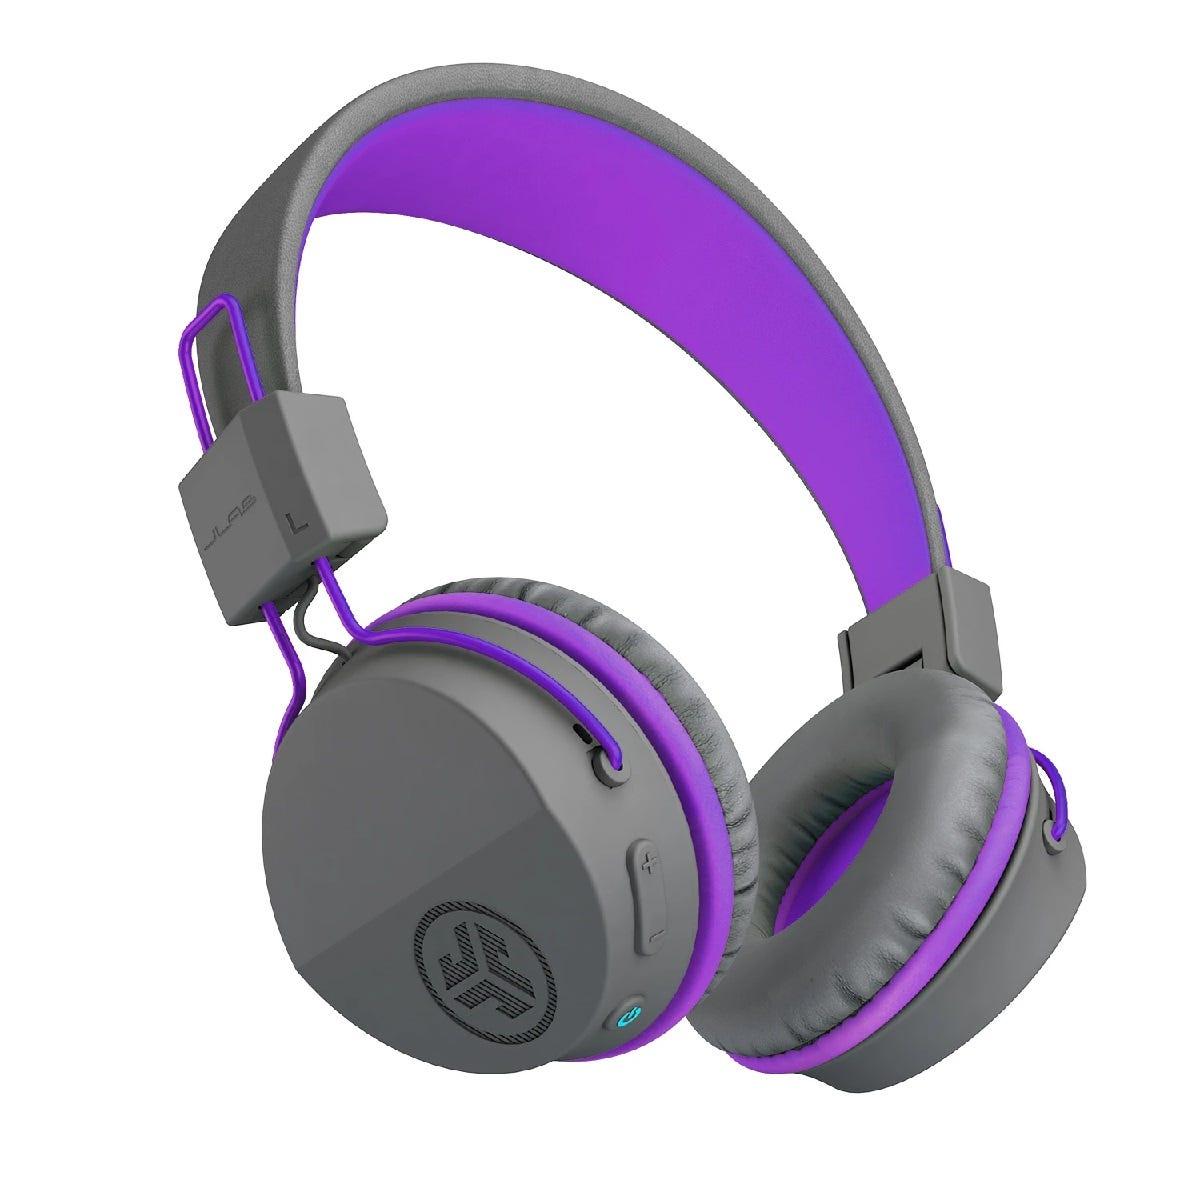 JLab JBuddies Studio Wireless Over Ear Kids Foldable Headphones - Grey/Purple